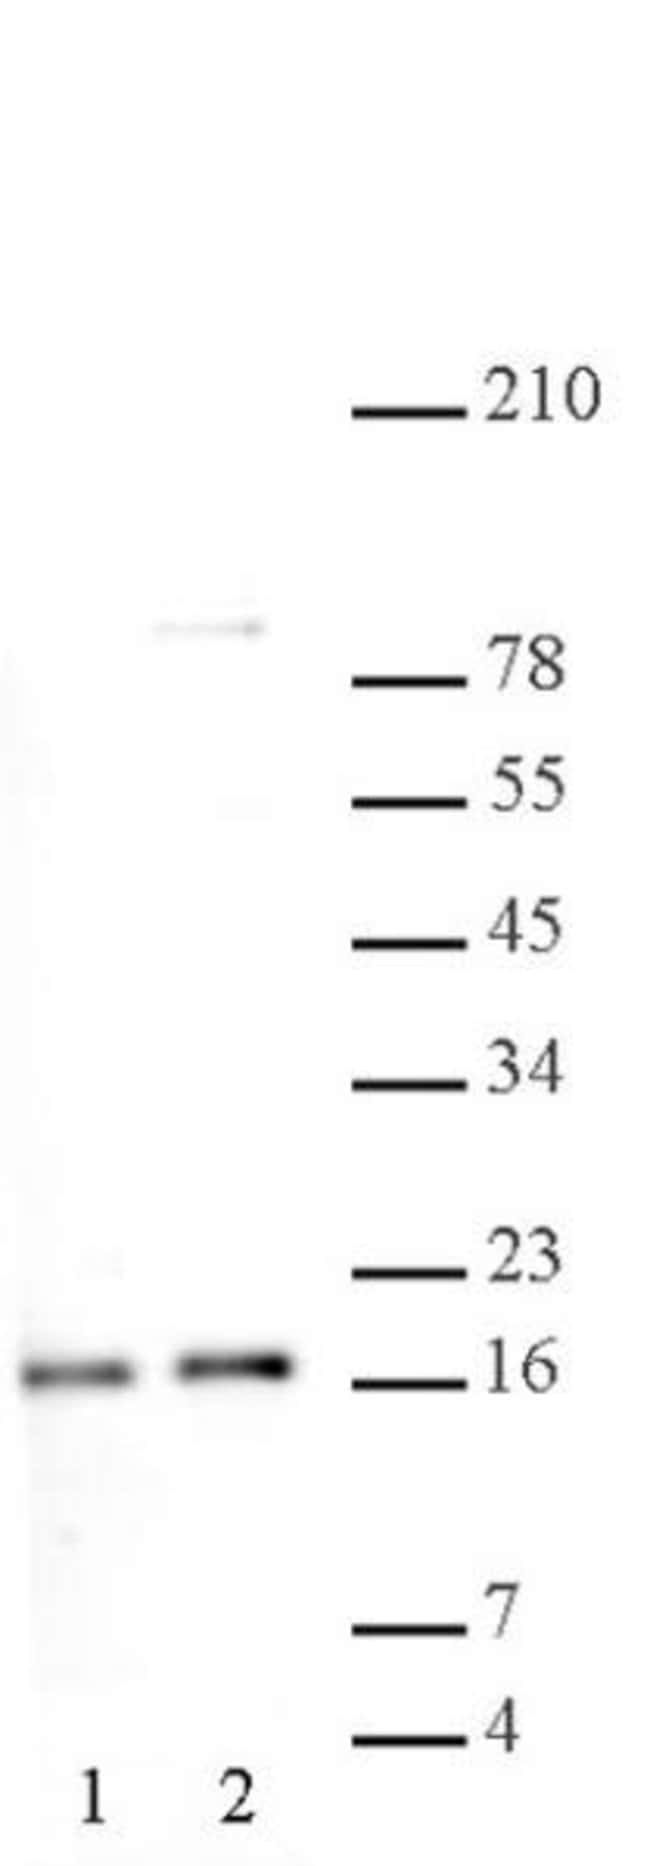 Histone H2A, acidic patch Rabbit anti-Human, Unconjugated, Polyclonal,